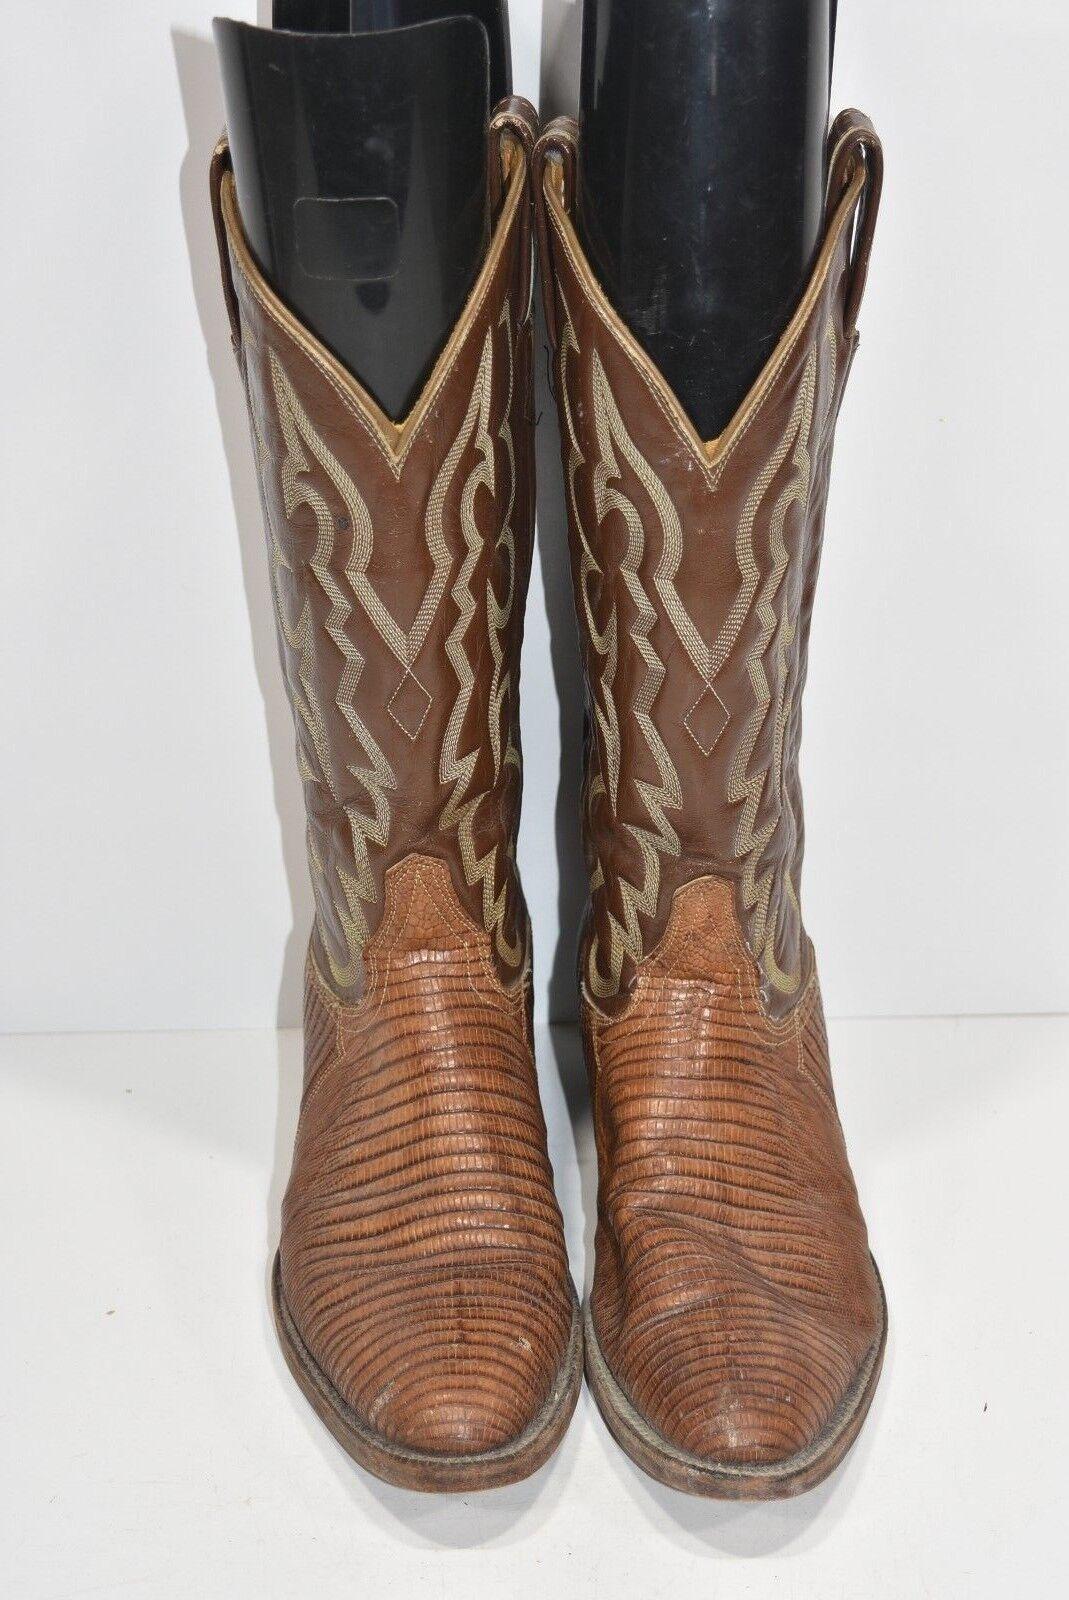 Tony Lama 7.5 B Teju lagarto Marrón Cuero Clásico Clásico Clásico botas de vaquero occidental Ropers f6d510